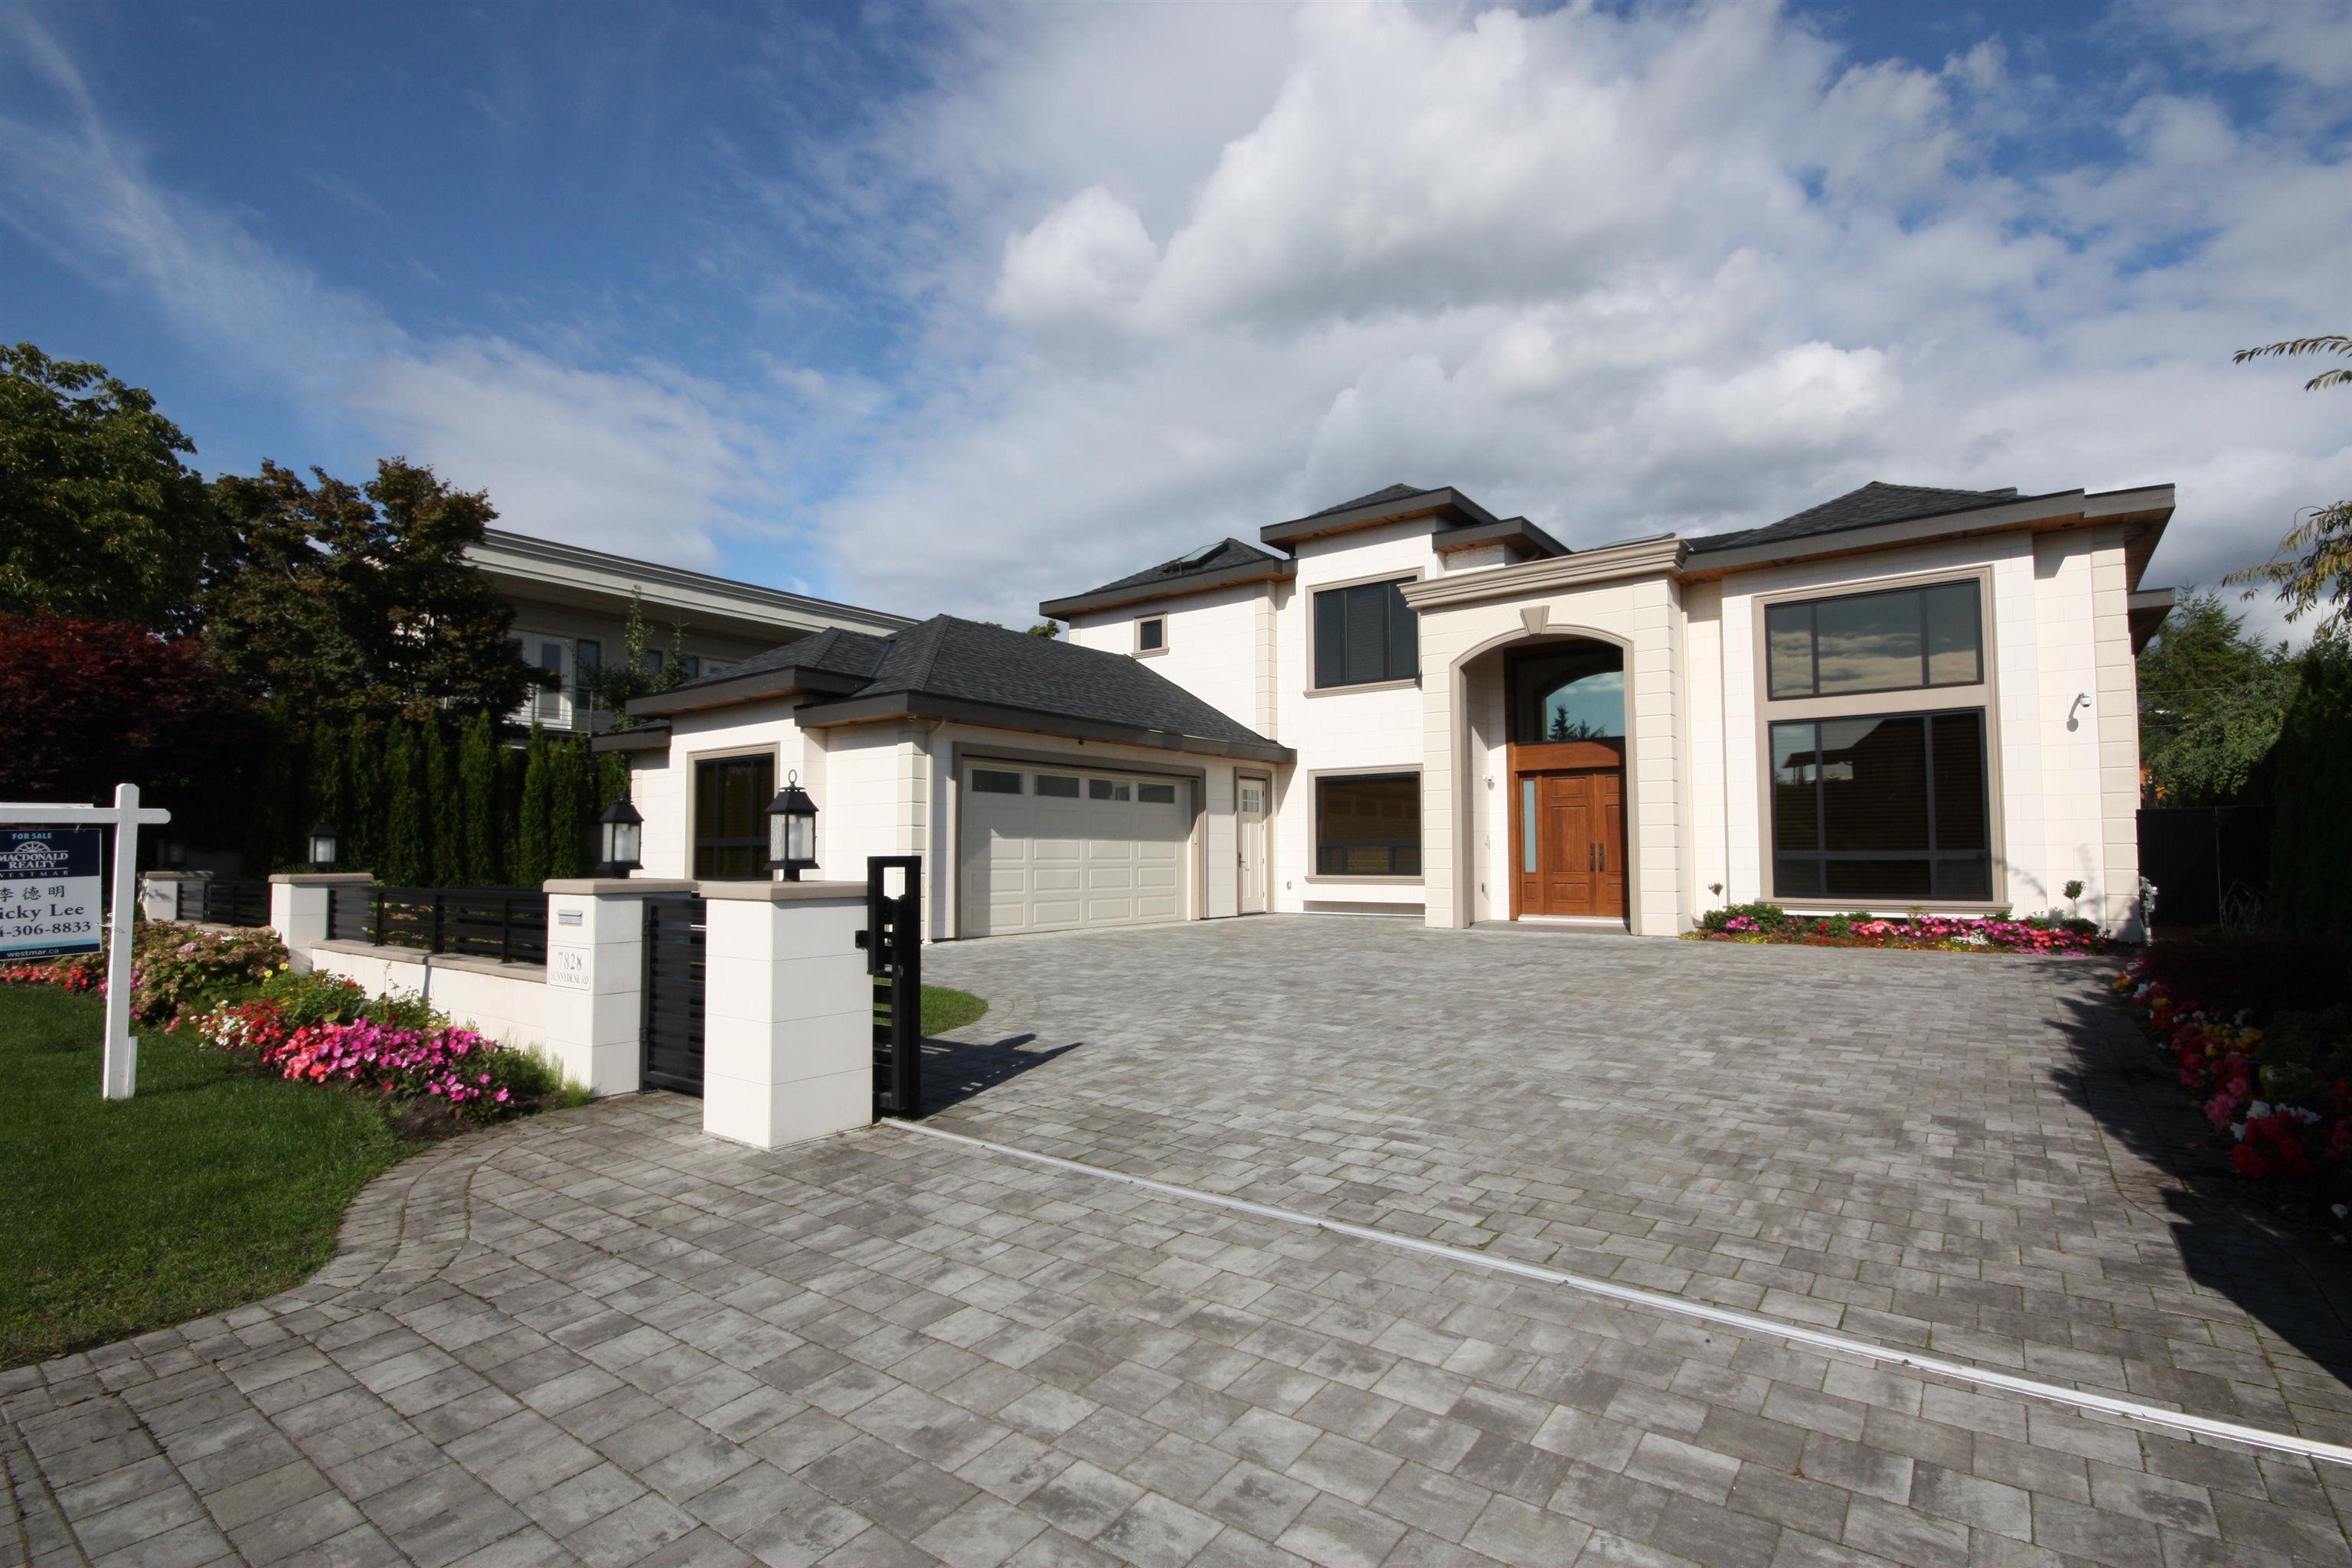 Main Photo: 7828 SUNNYDENE Road in Richmond: Broadmoor House for sale : MLS®# R2624933